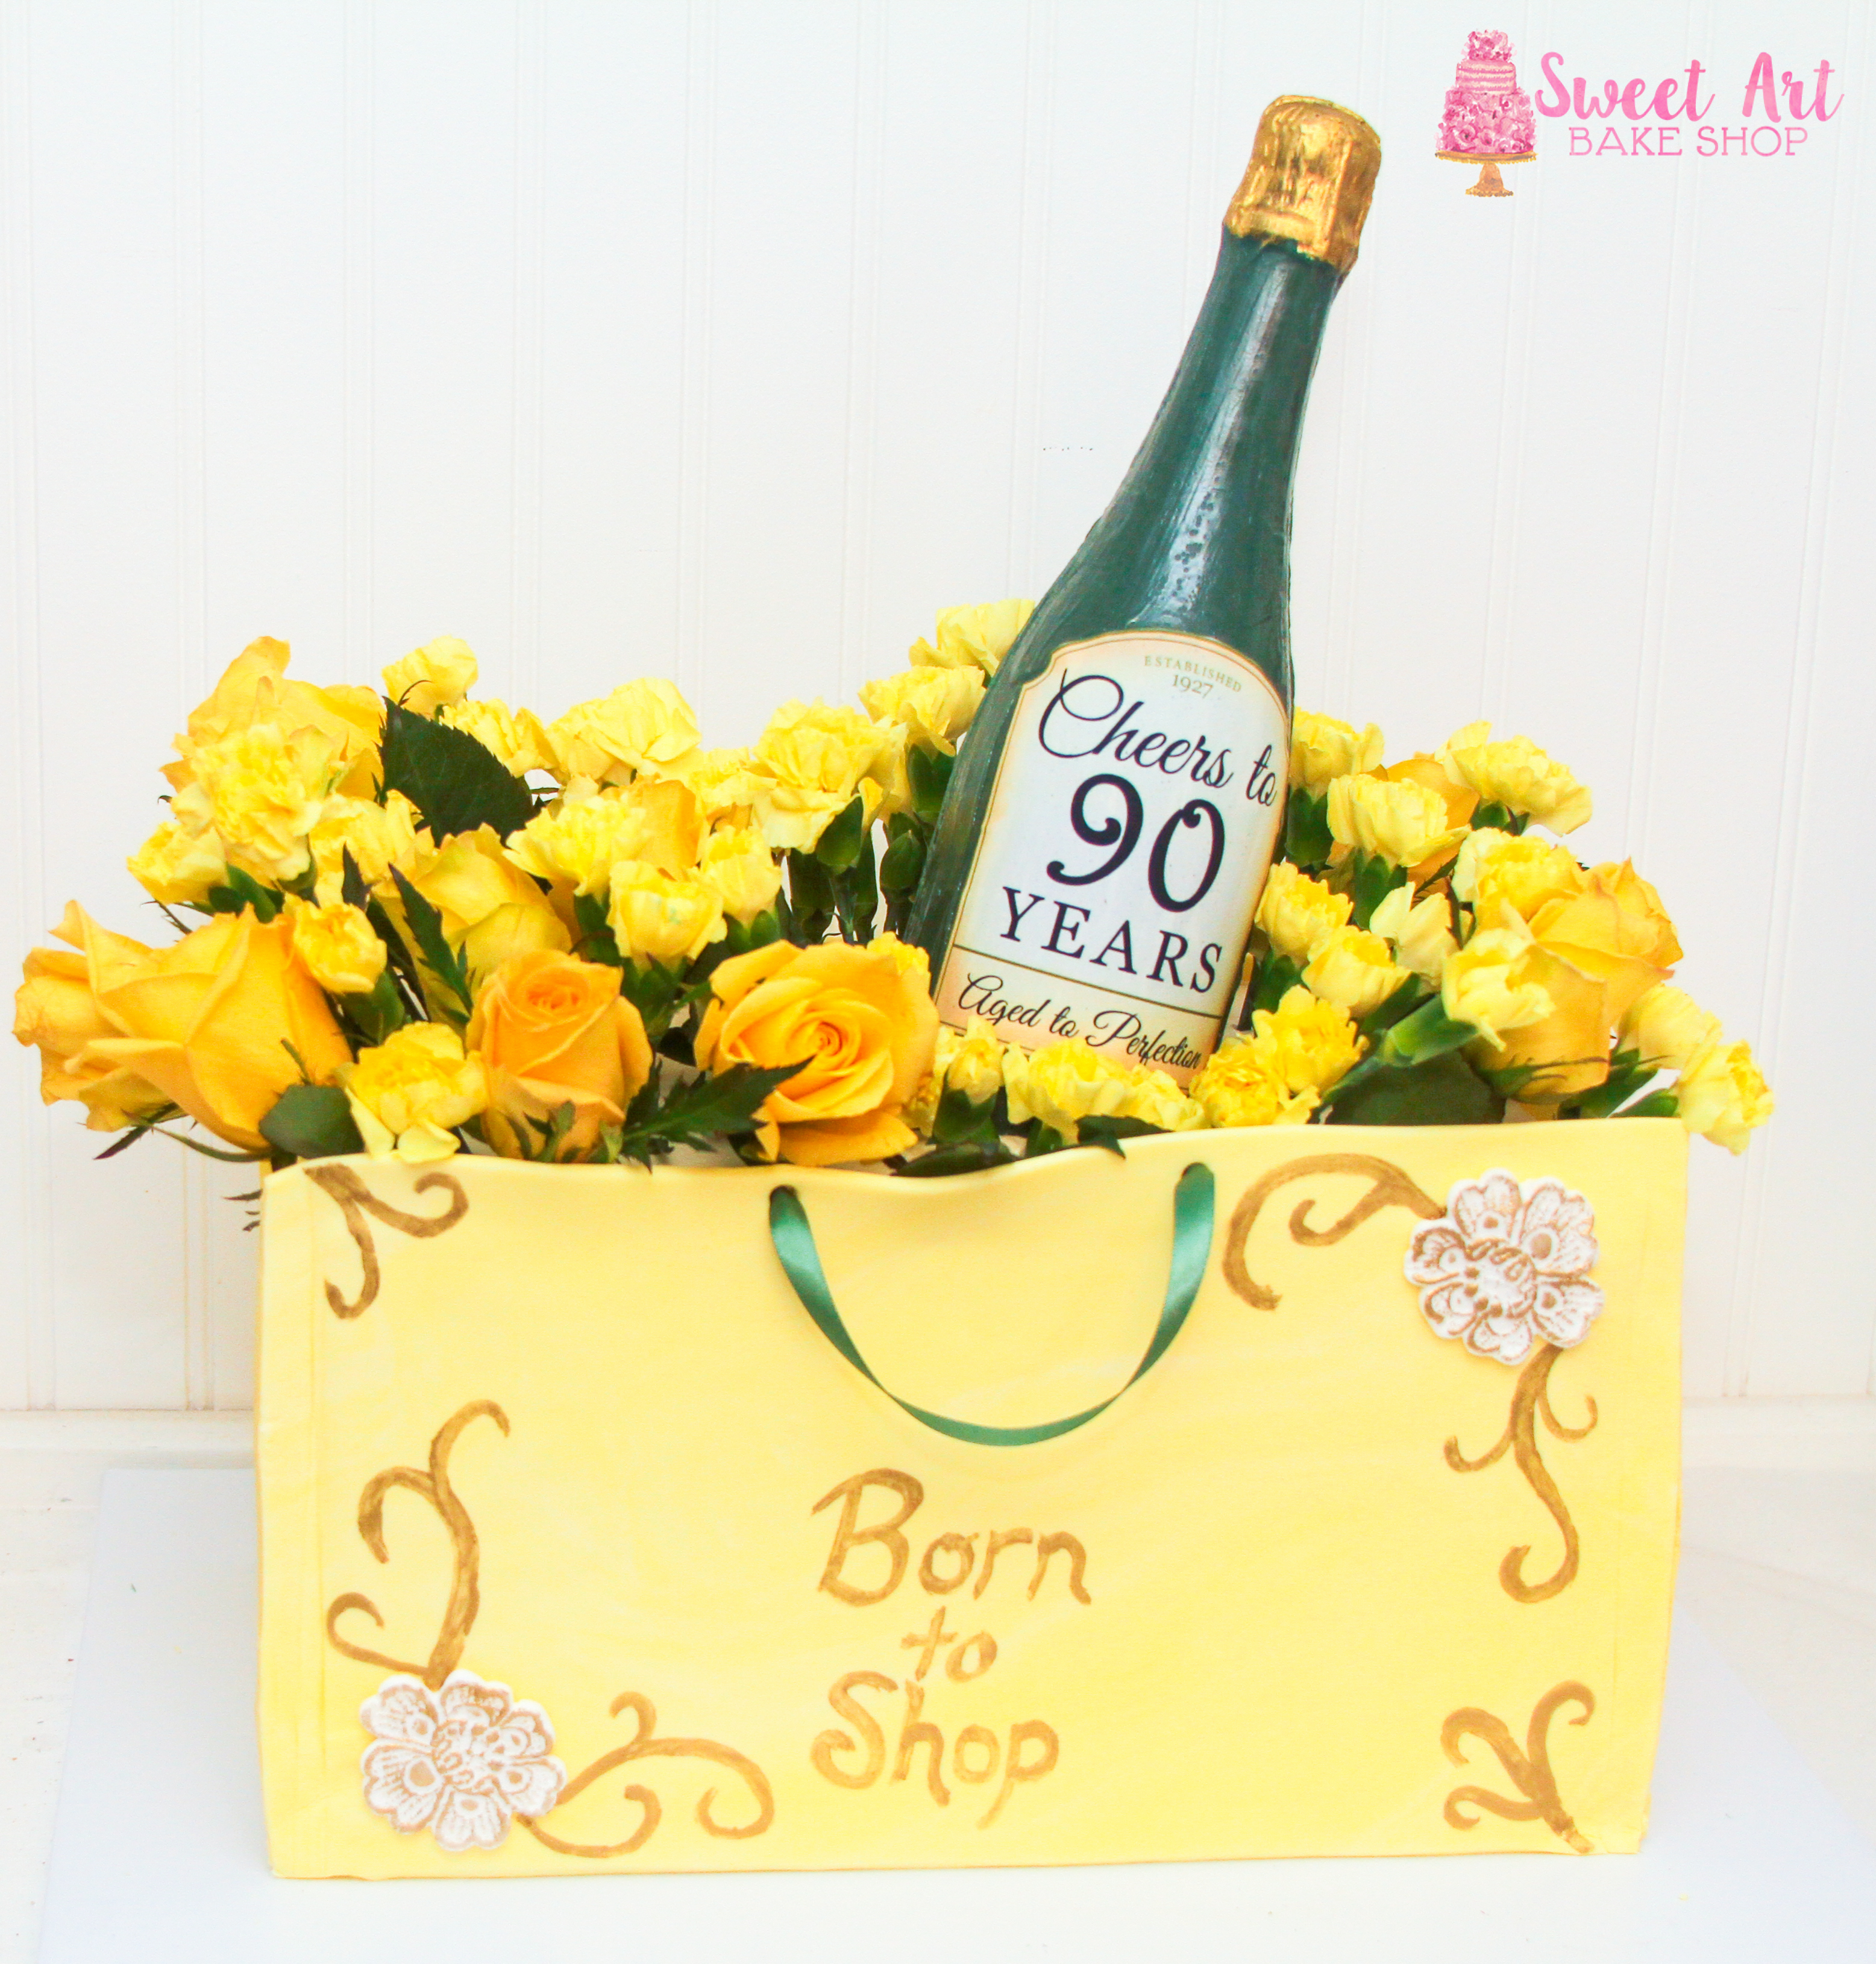 Champagne & Shopping Cake